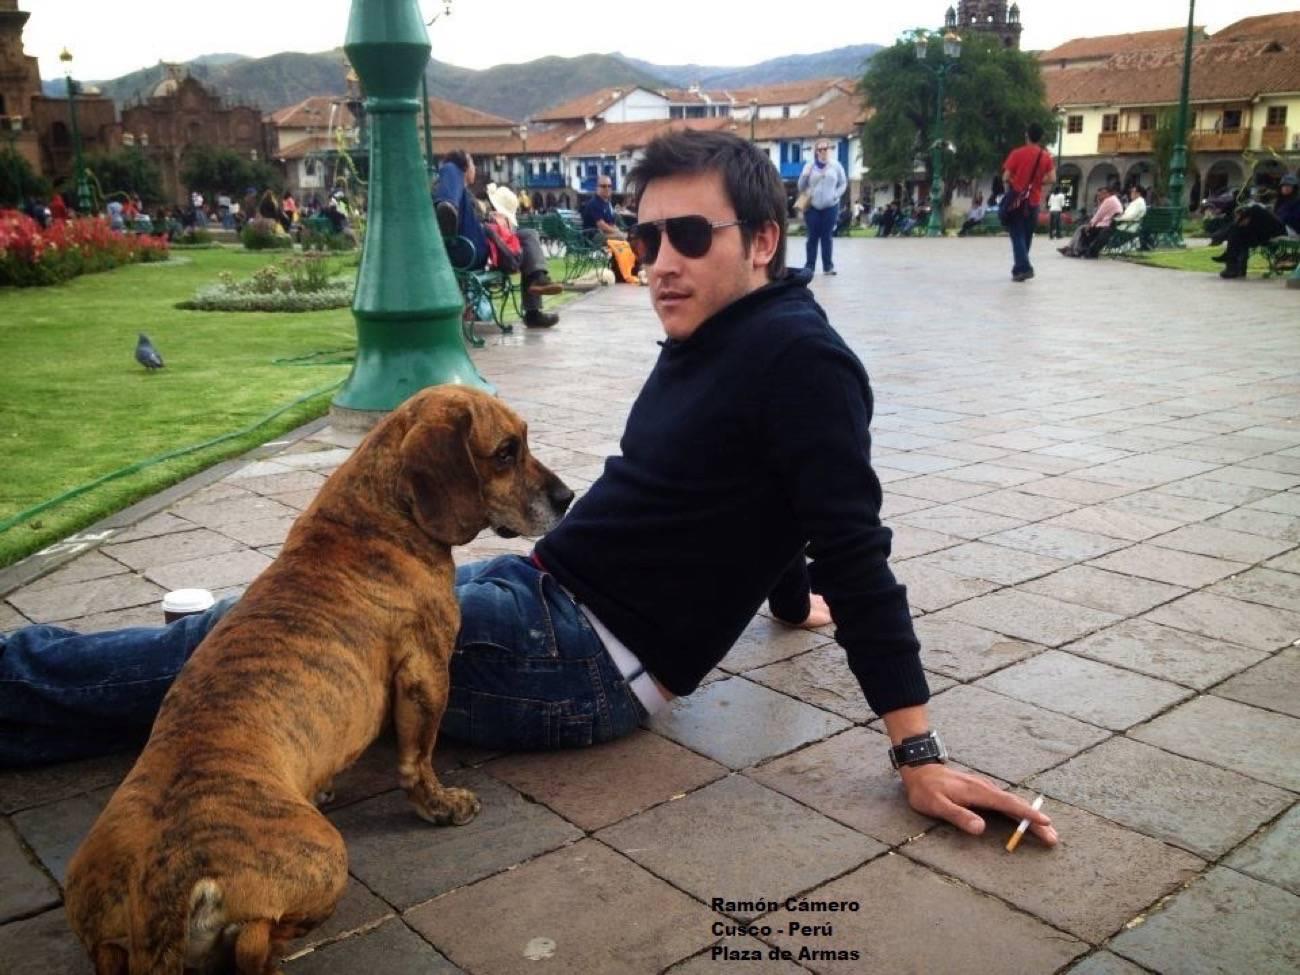 viajero o turista en plaza de armas con perro